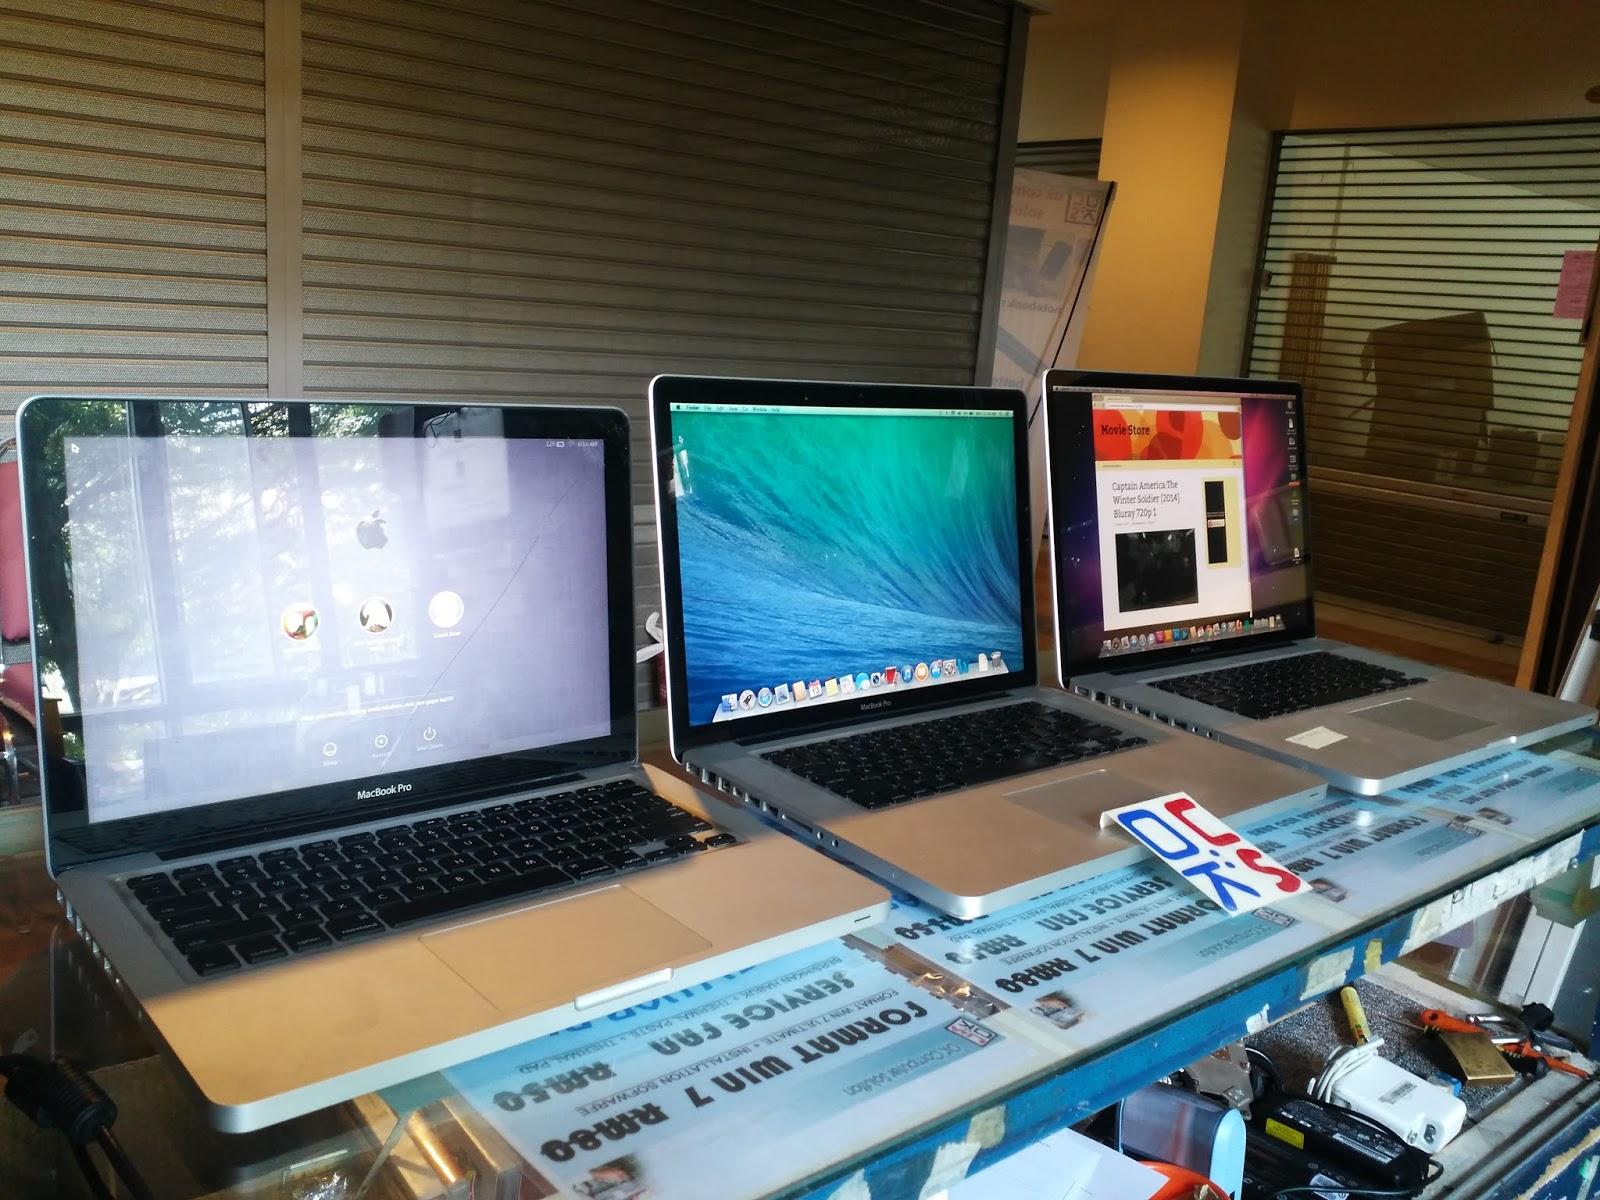 Untuk pen ahuan anda sistem operasi yang digunakan oleh Apple Macbook ini adalah tidak sama seperti apa yang sistem operasi Windows gunakan